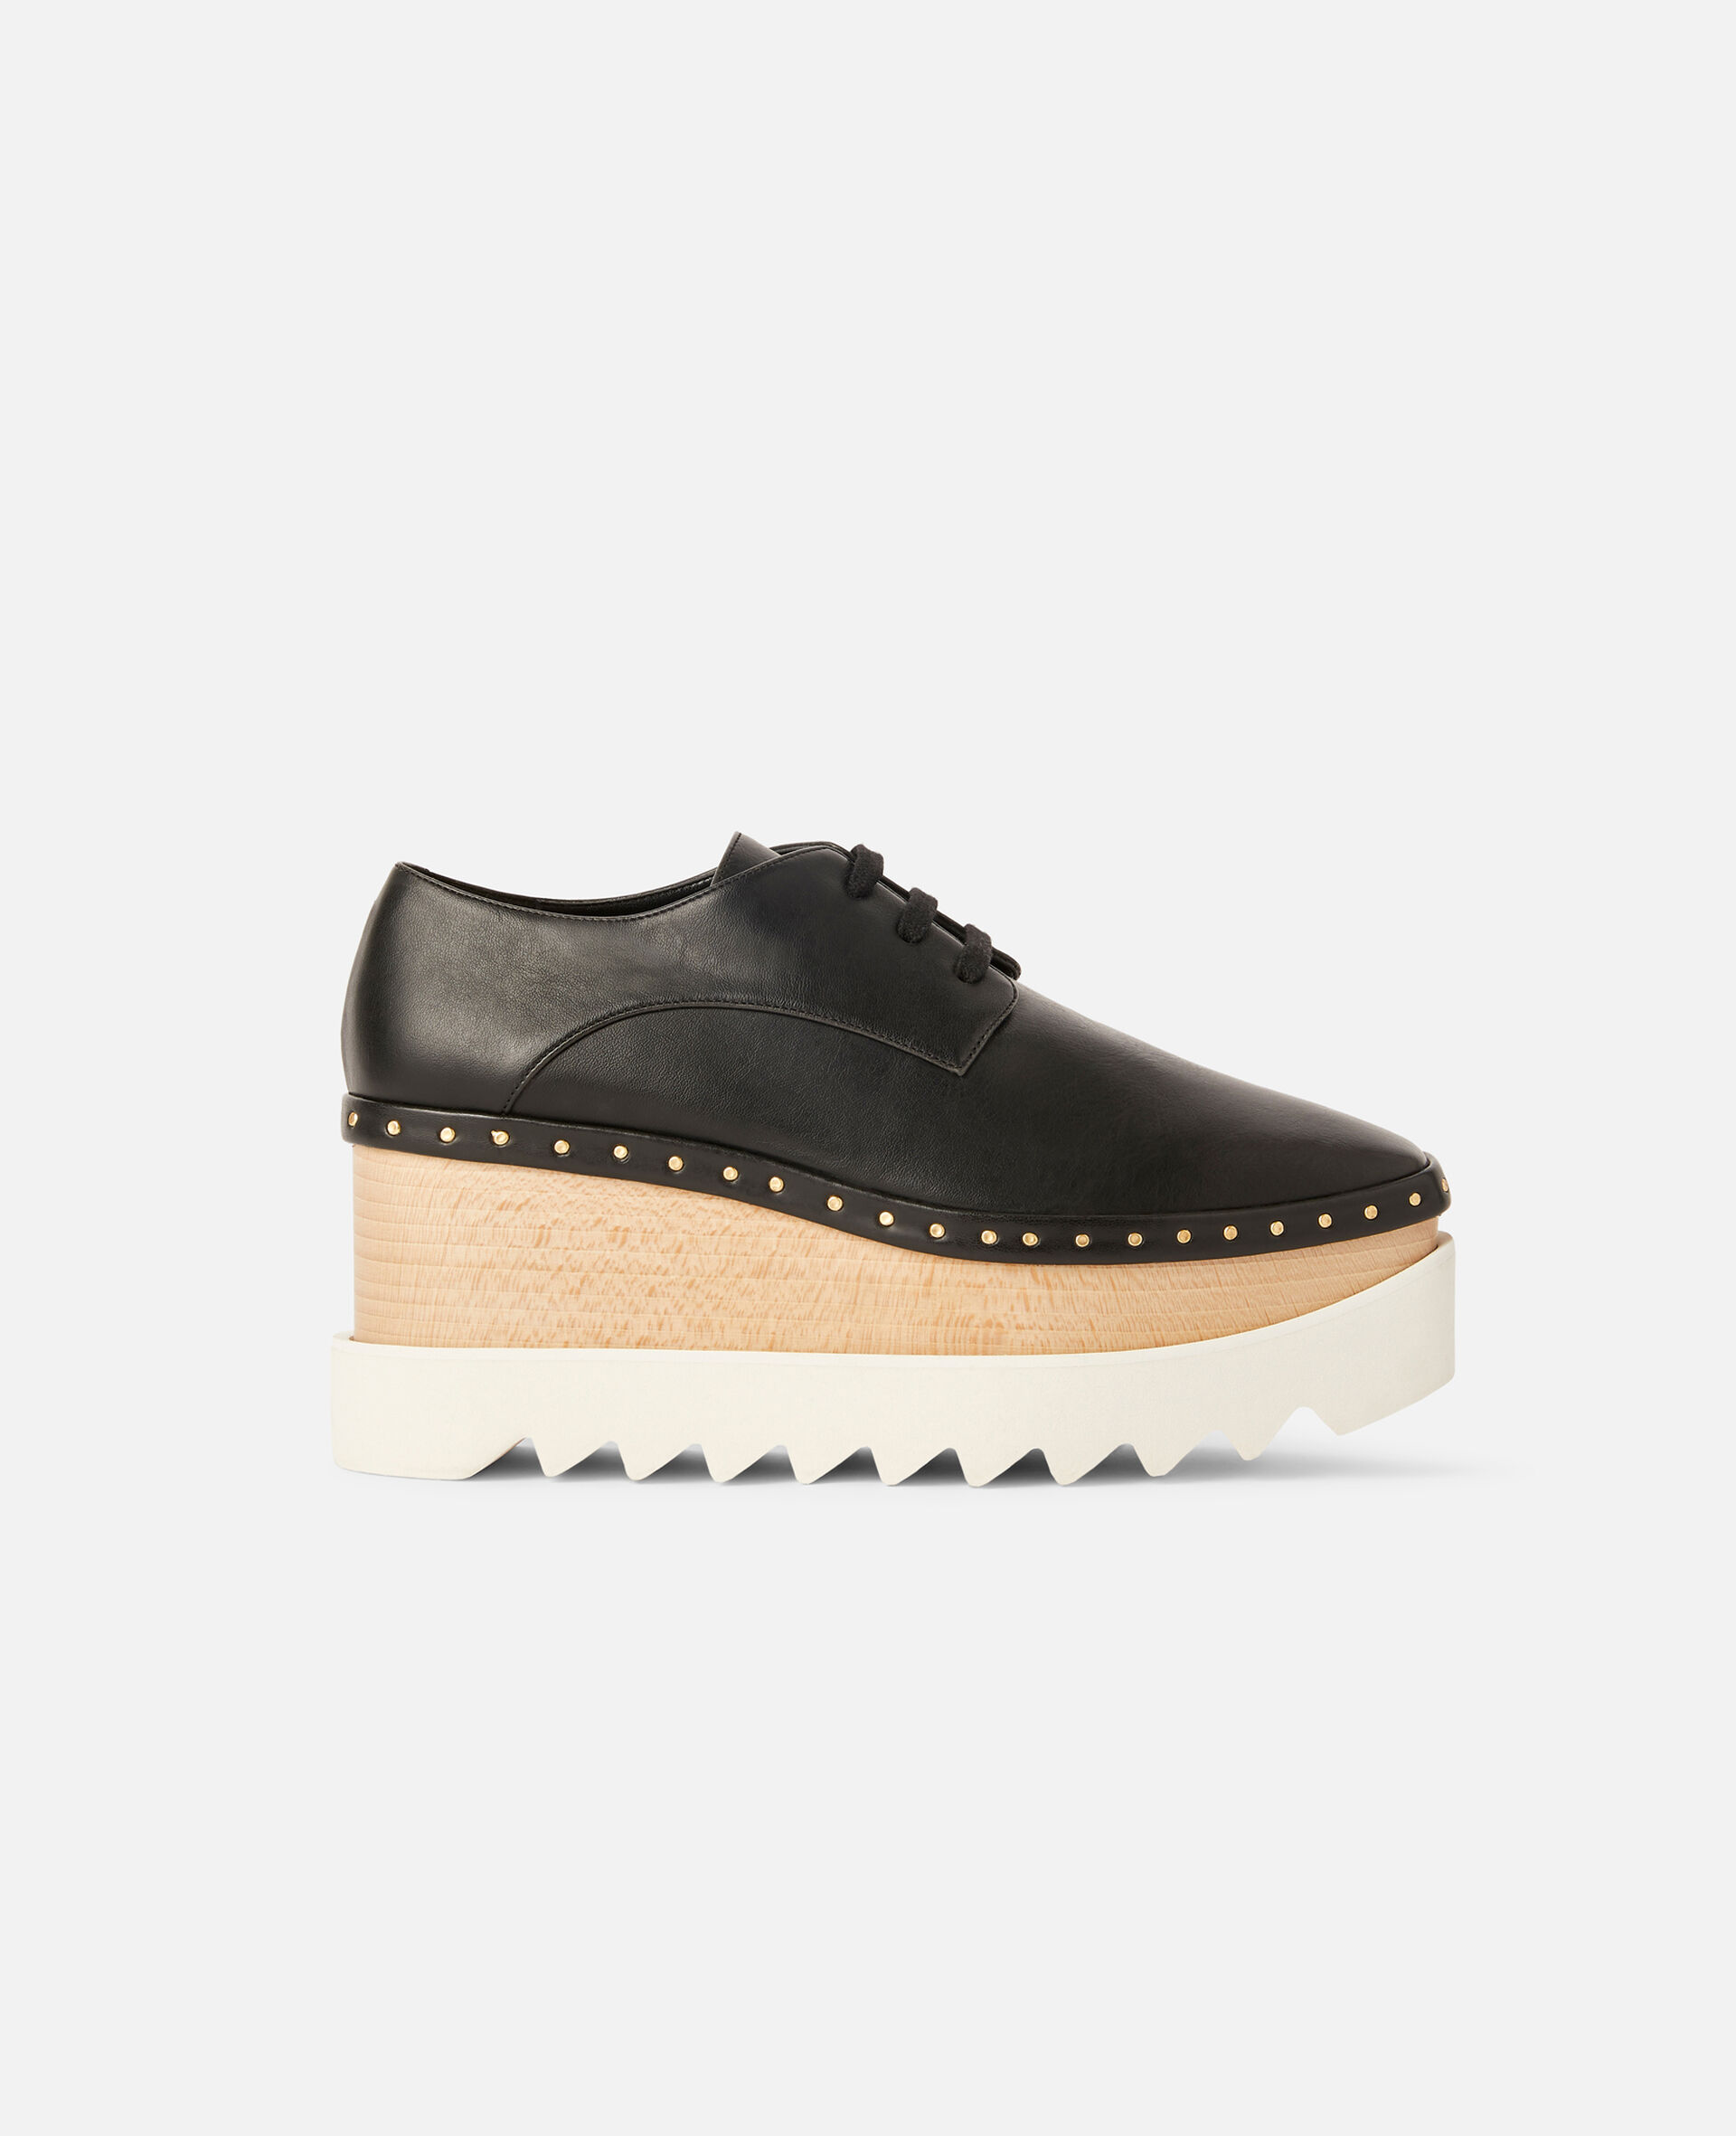 Chaussures compensées Elyse-Noir-large image number 0